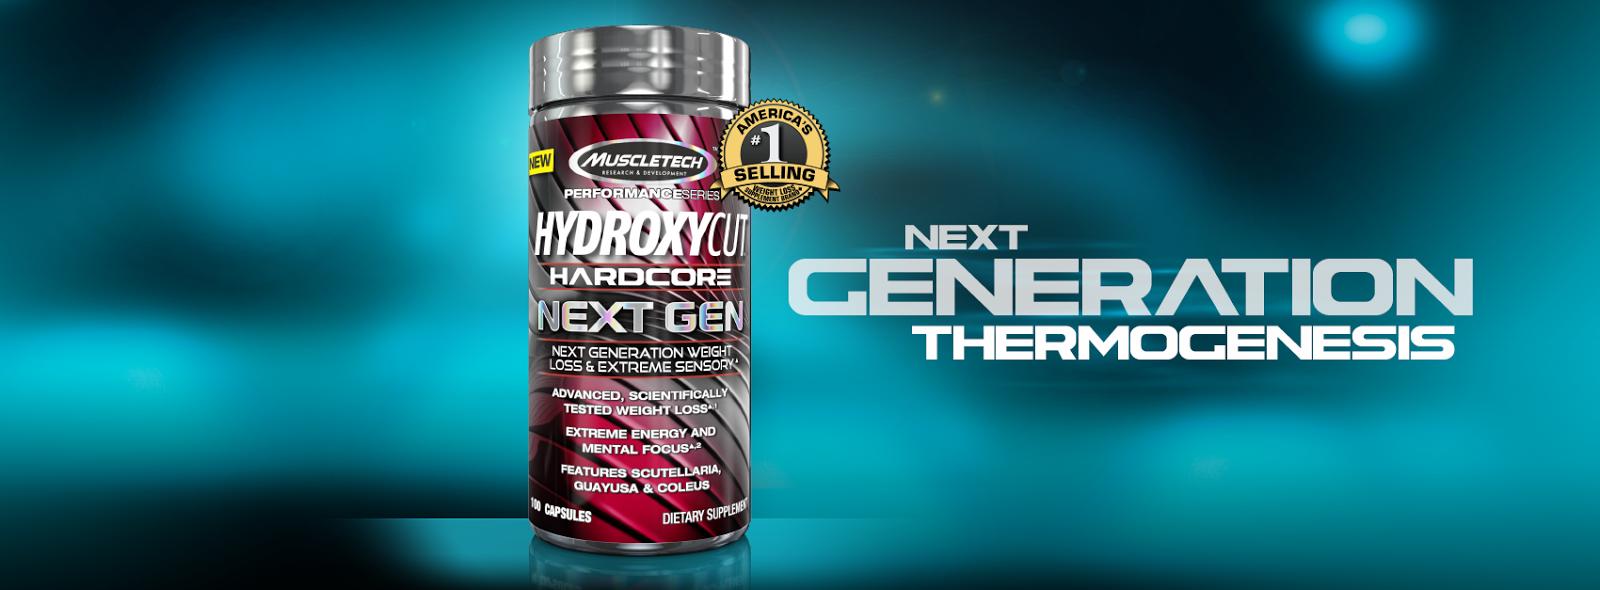 Comprar Hydroxycut Hardcore Elite 110 caps